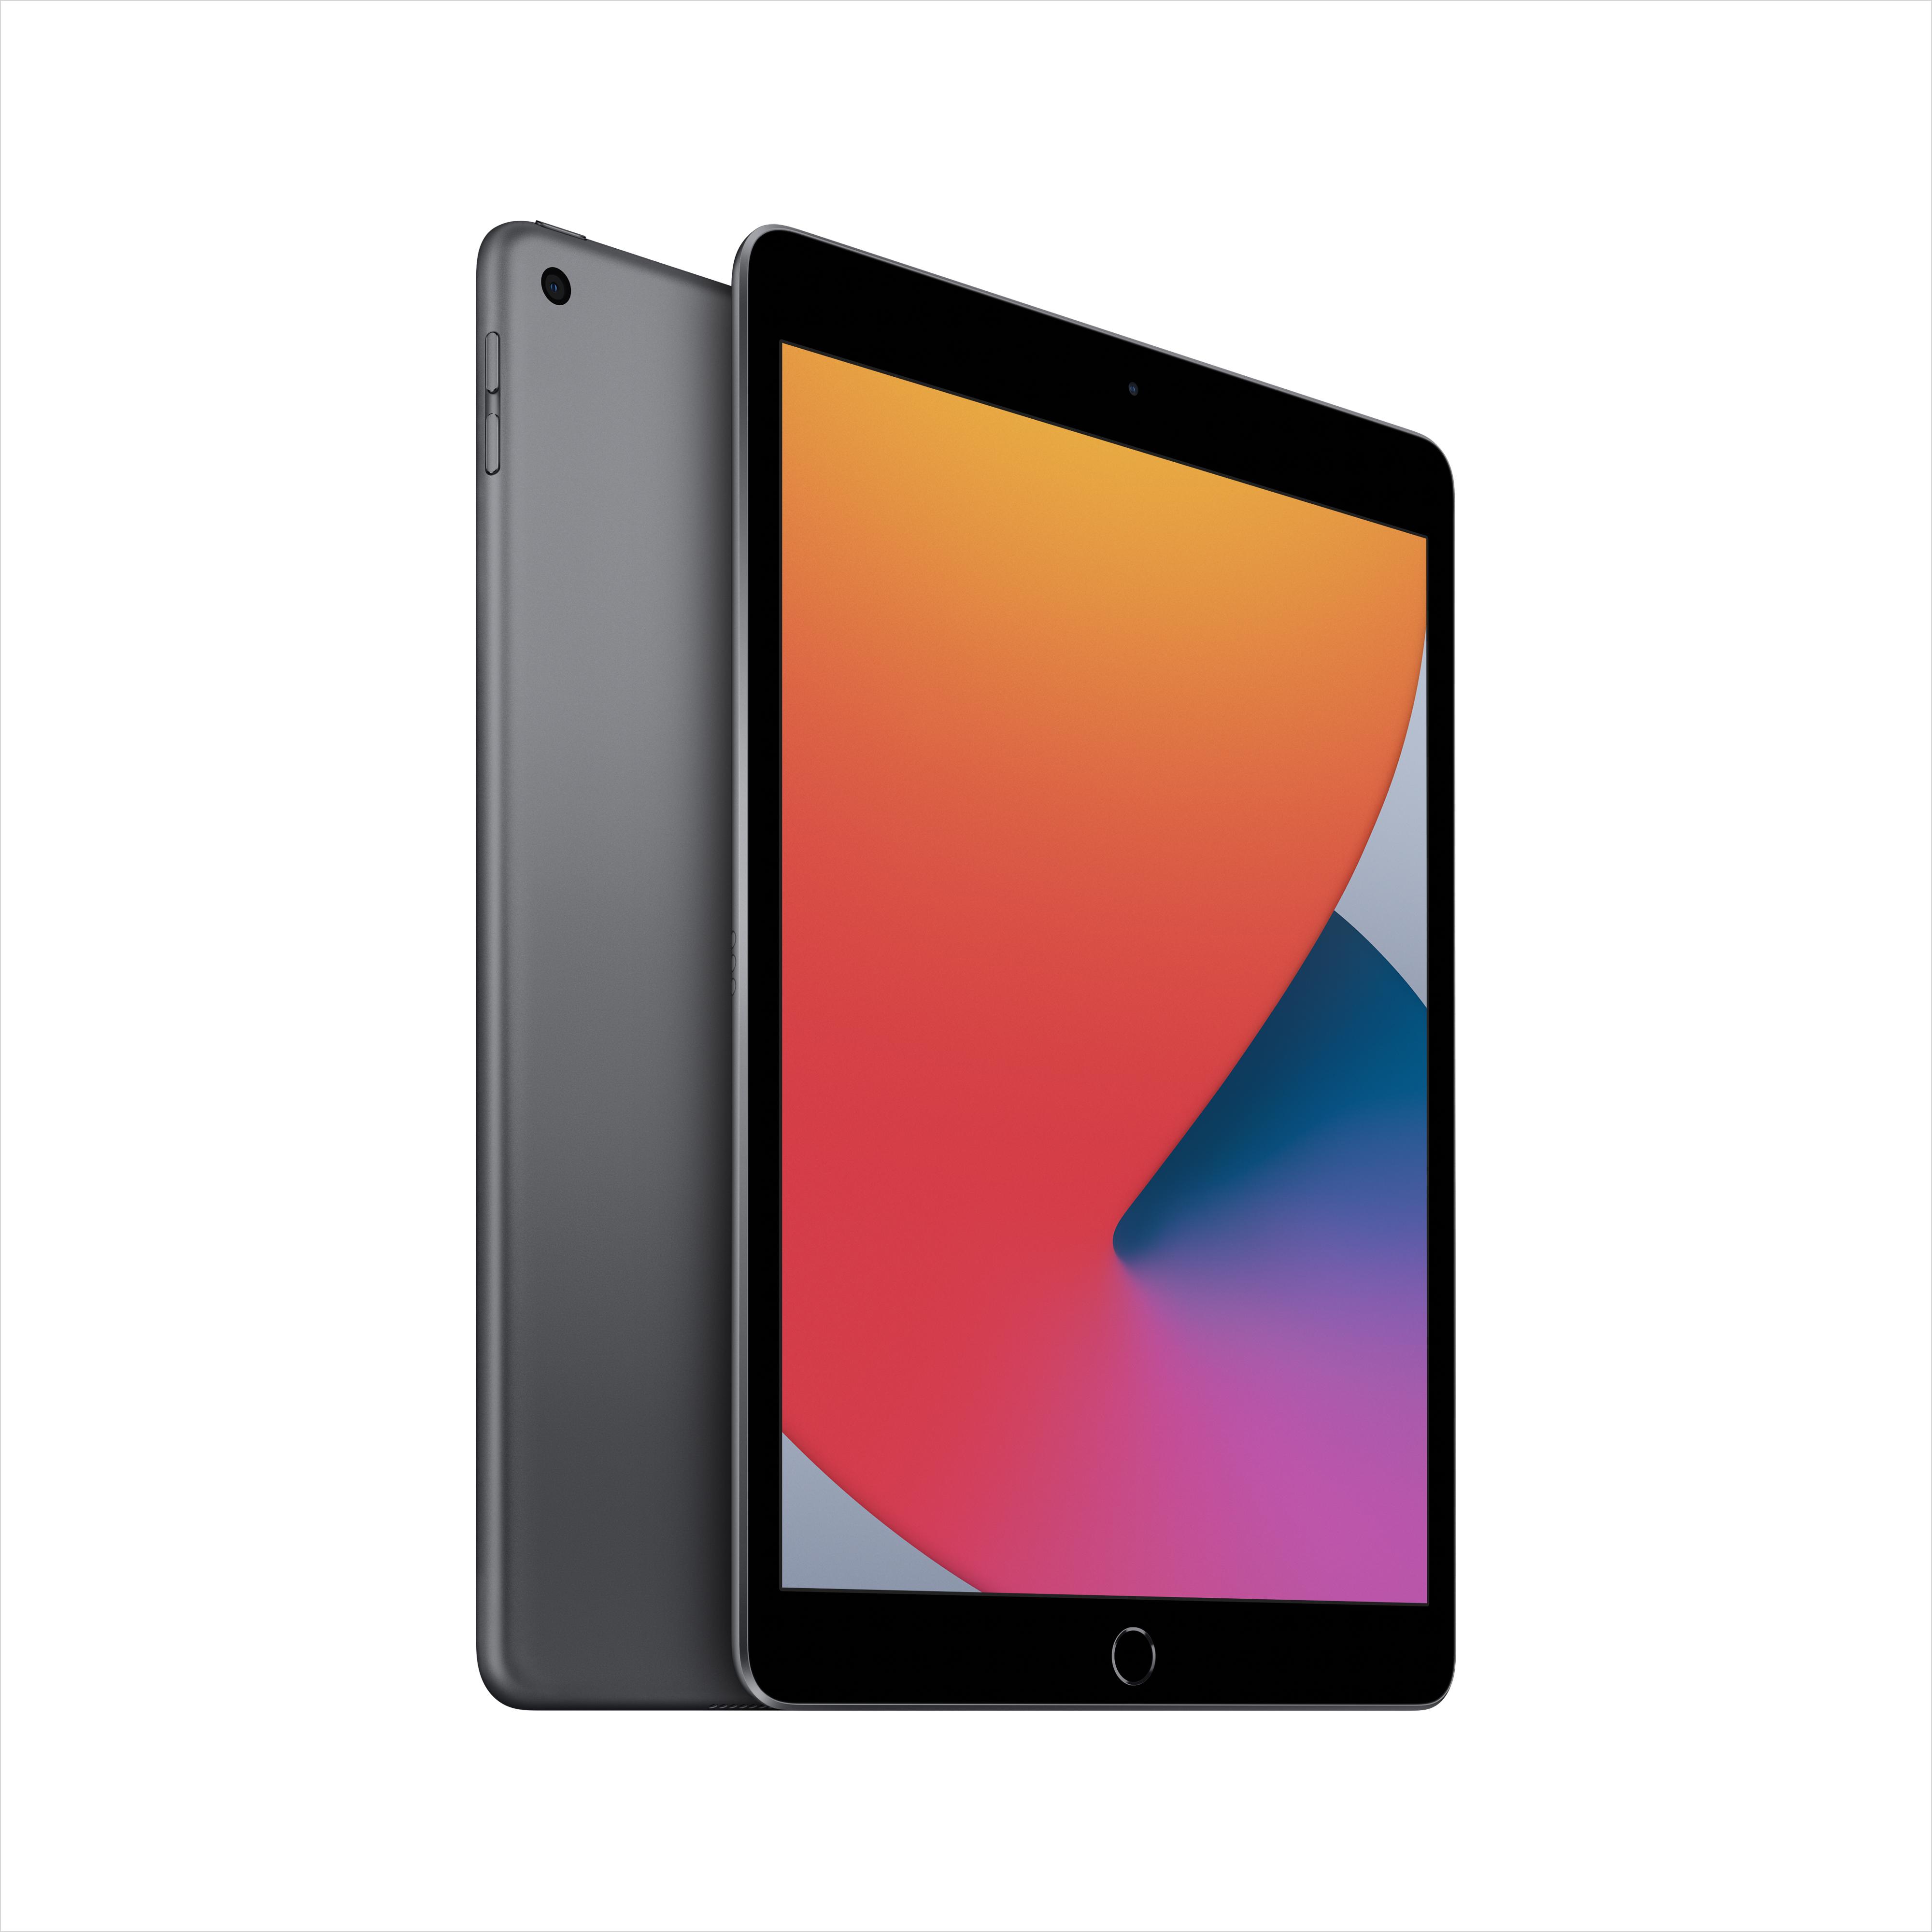 Apple 10.2-inch iPad (8th Gen) Wi-Fi 32GB - Space Gray $299 at Walmart